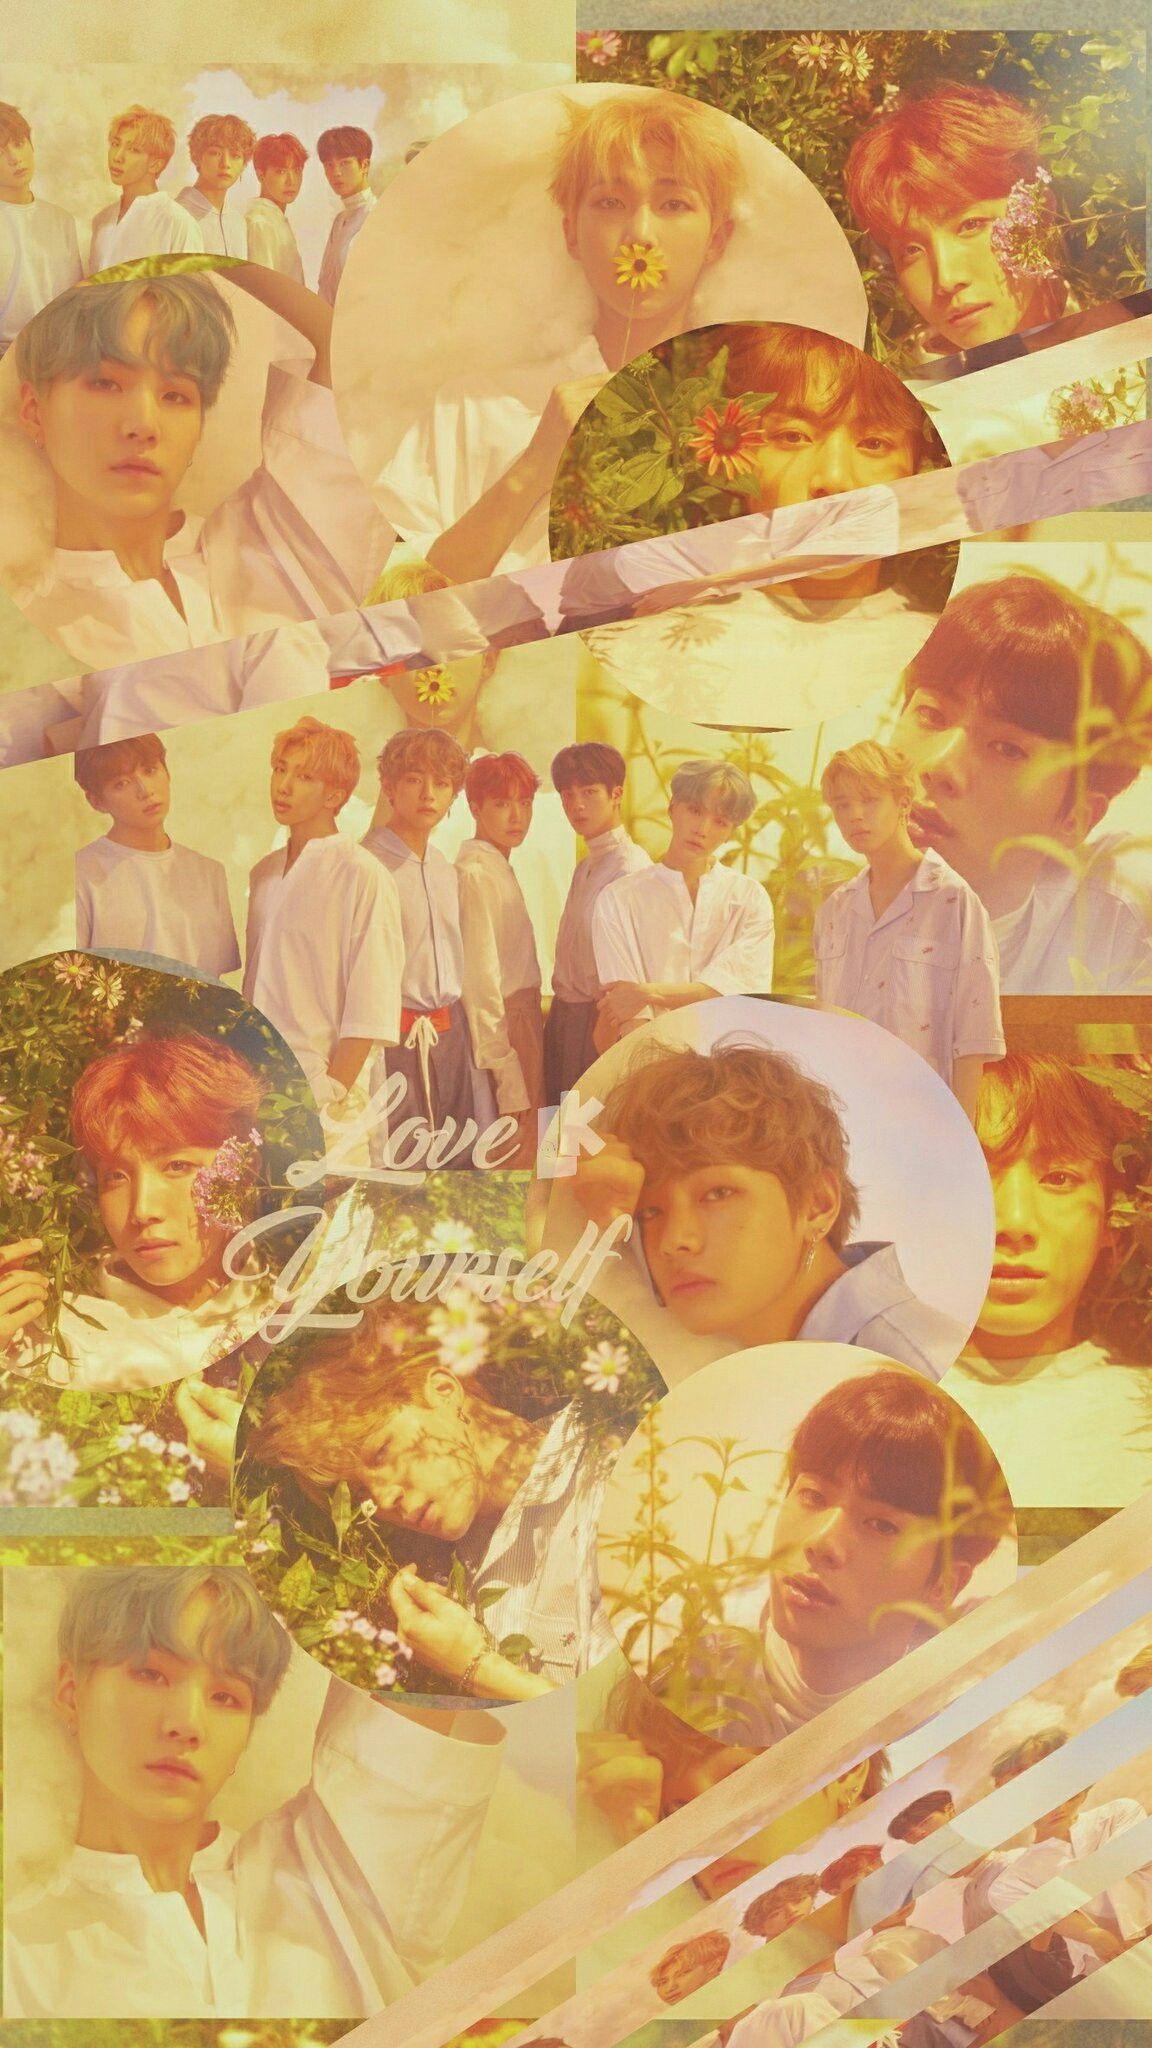 bts wallpaper image by kule on bts aesthetic